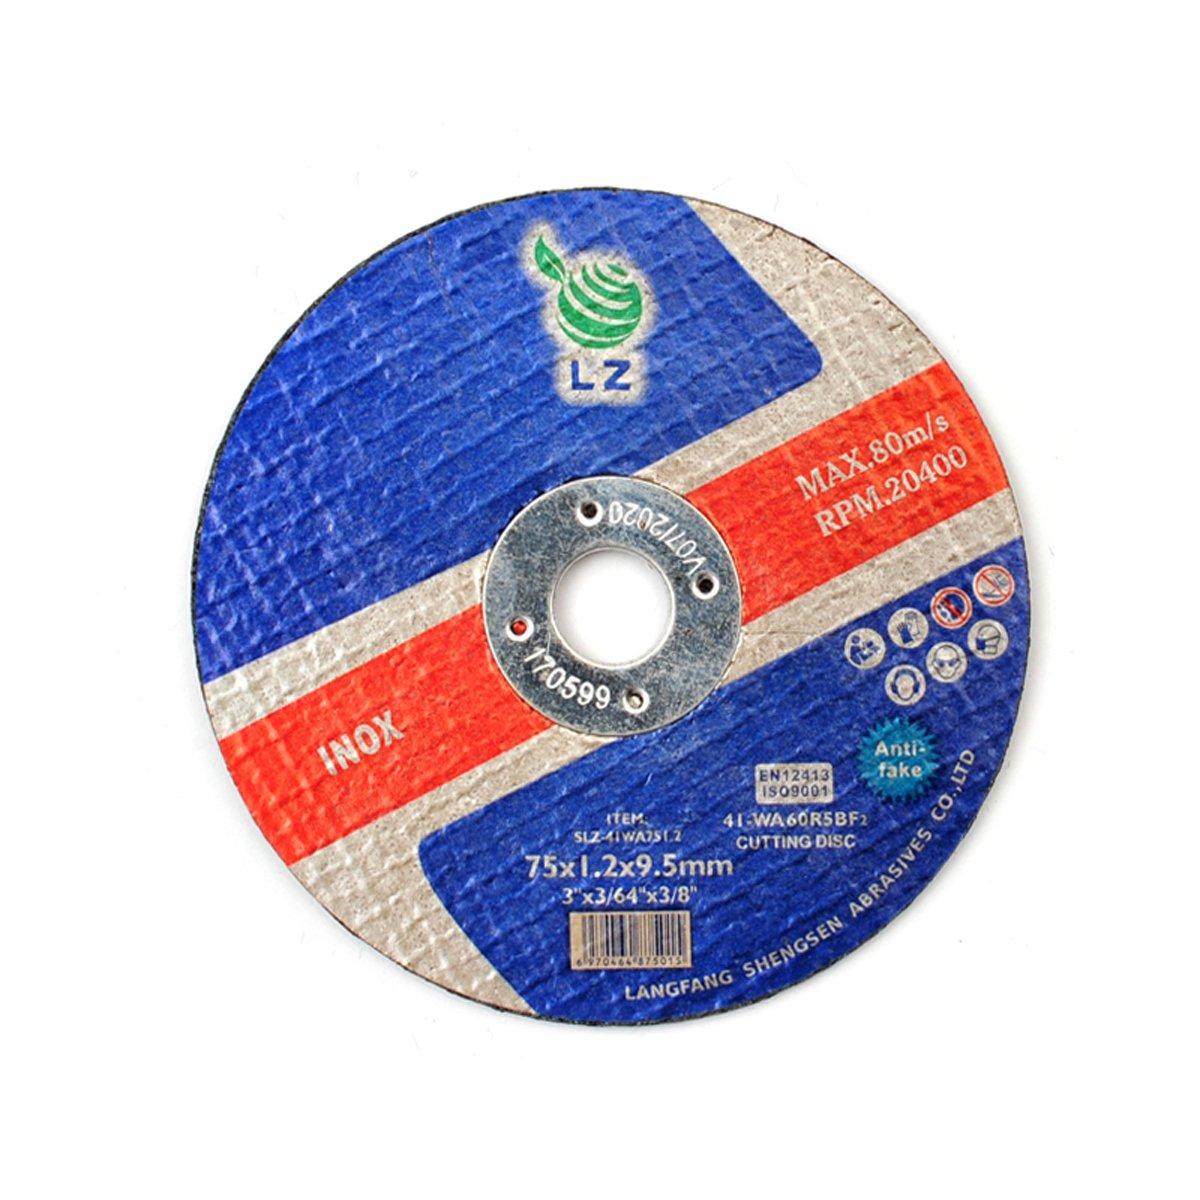 Cutting wheel Metal 75mm x 1mm x 9.5mm(3'')– Set of 25, cutting disc Air tool stainless steel cut off wheels